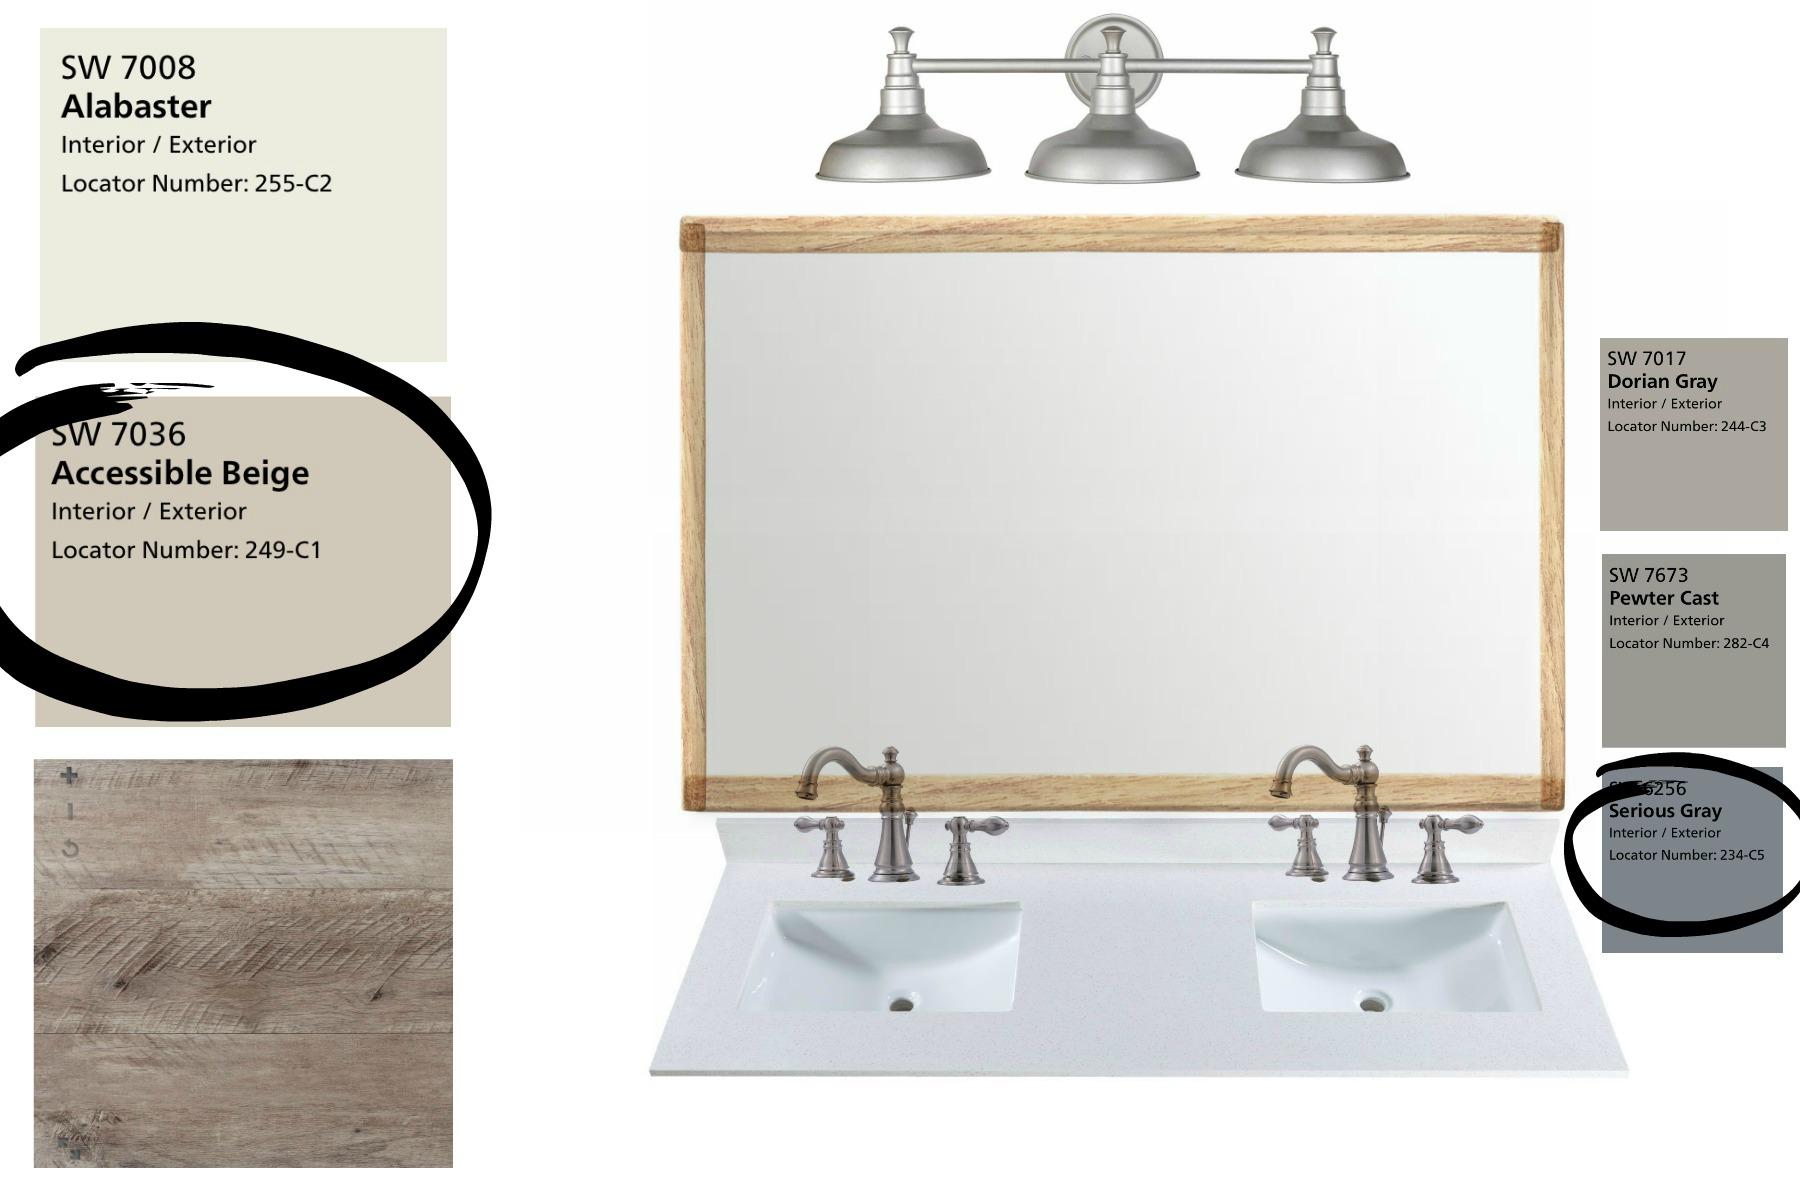 The Simple Abode's Interior Design Project Style Board- By Plum Pretty Decor and Design